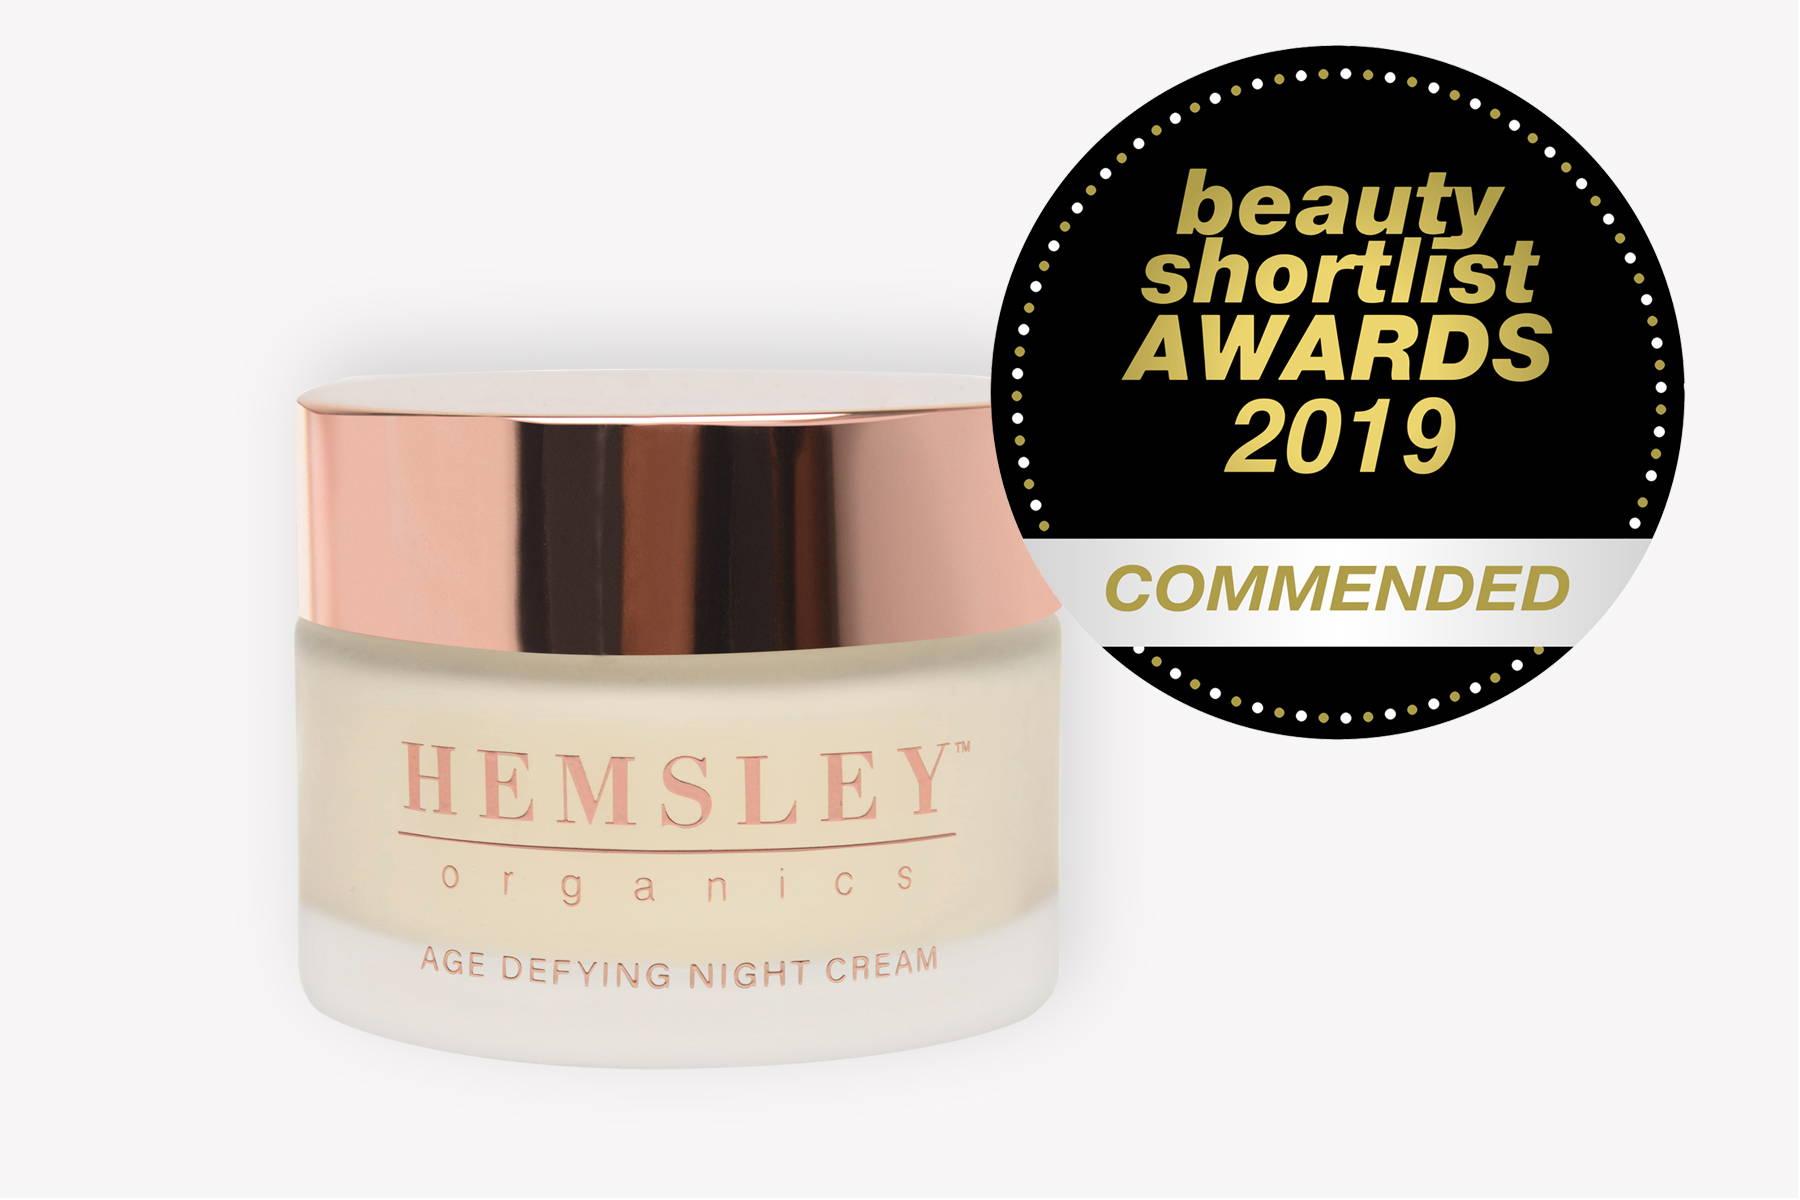 award winning, beauty shortlist, award, commended, 2019, night cream, skincare, skincare award